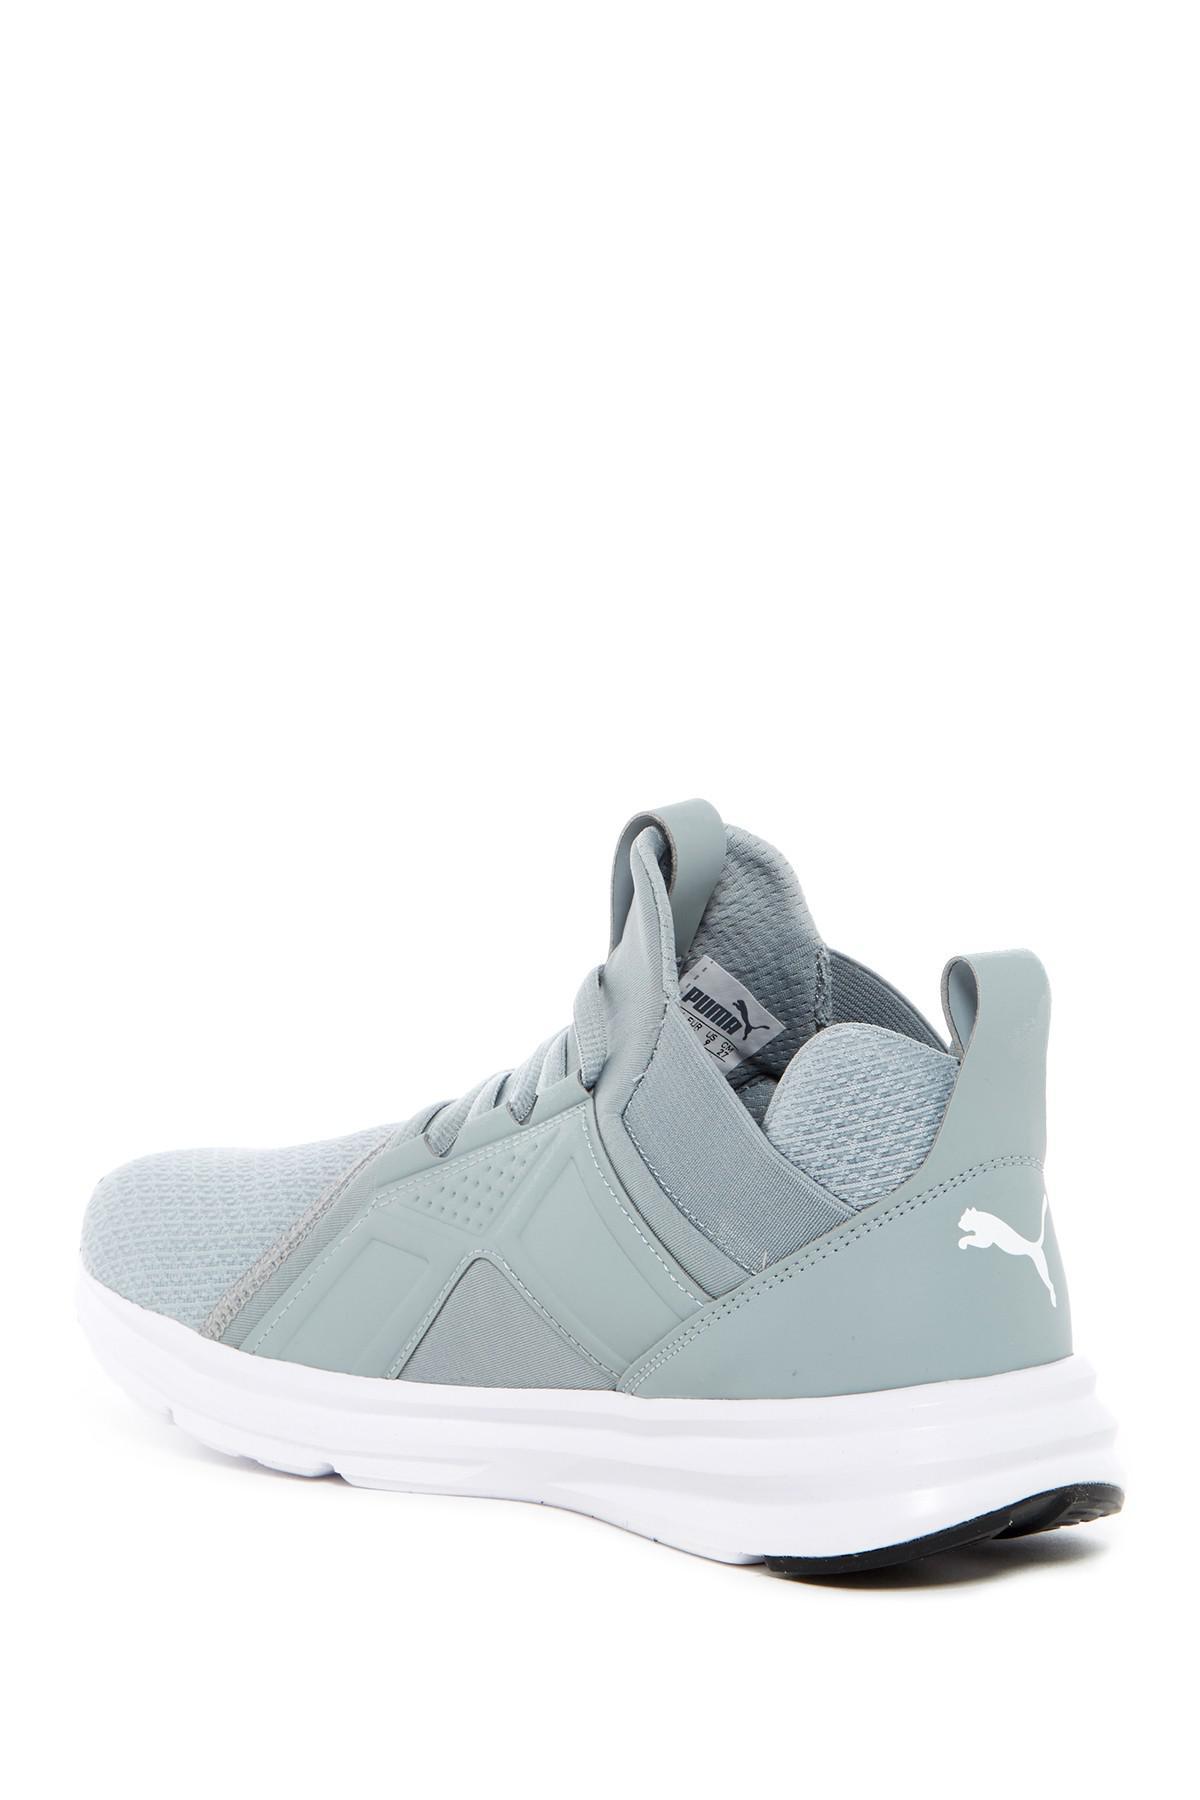 bfa75bcfd814 Lyst - PUMA Enzo Mid Sneaker in Gray for Men